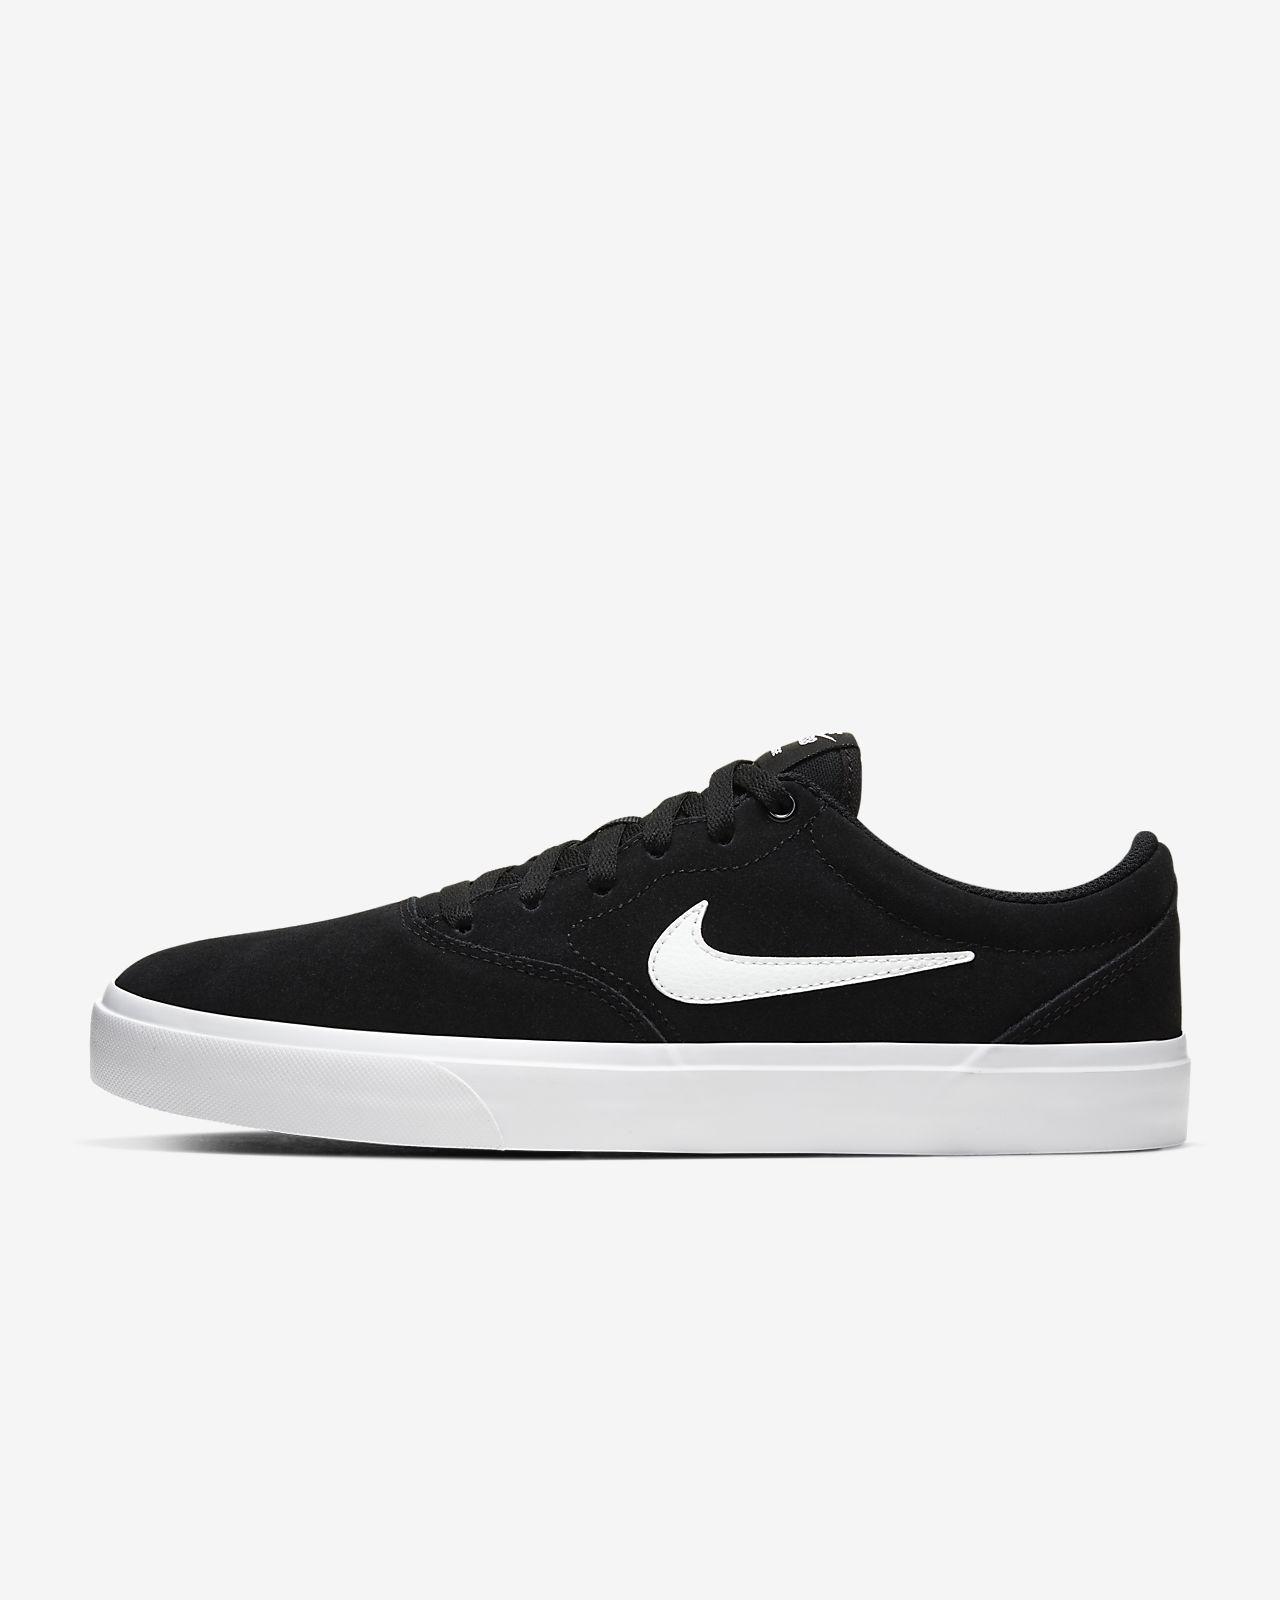 Nike SB Charge Suede Skate Shoe